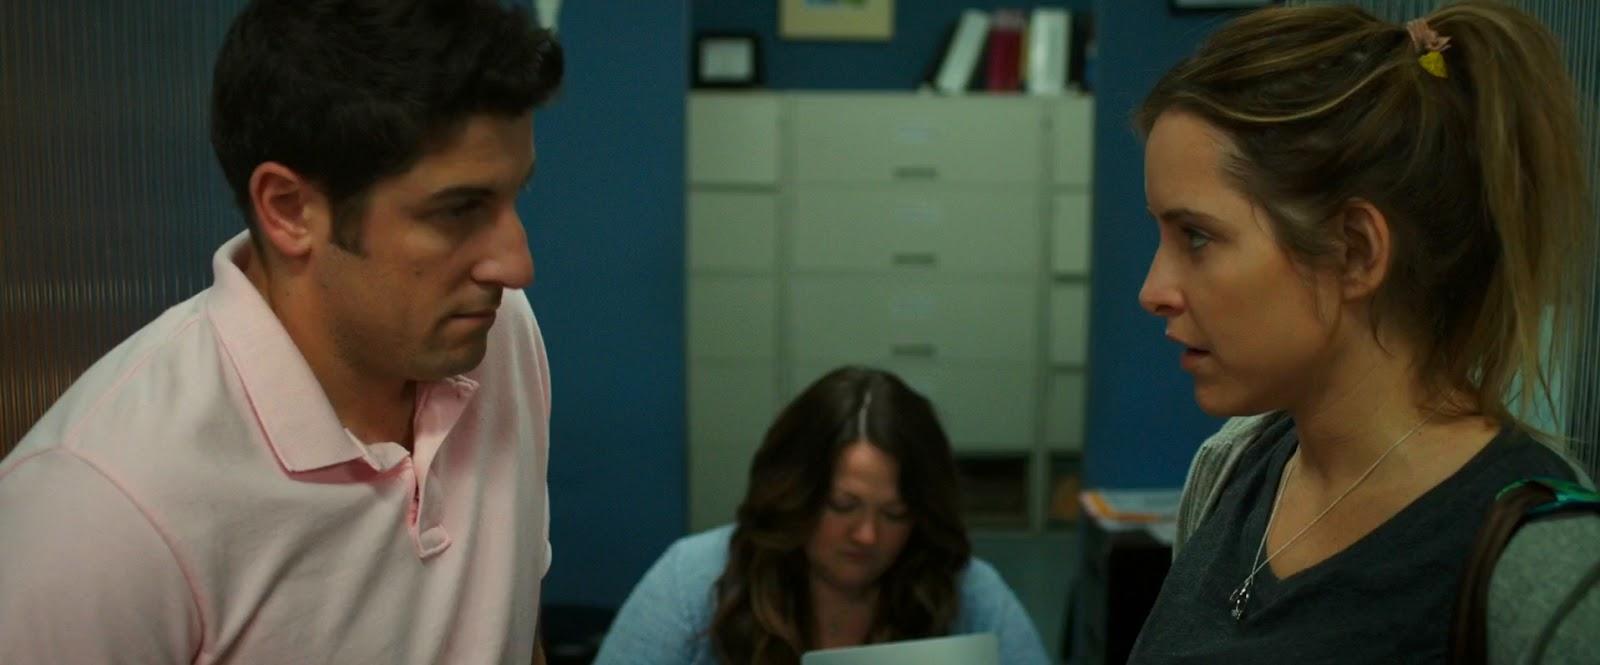 Un Chofer en Apuros (2016) 1080p Latino - Ingles captura 4